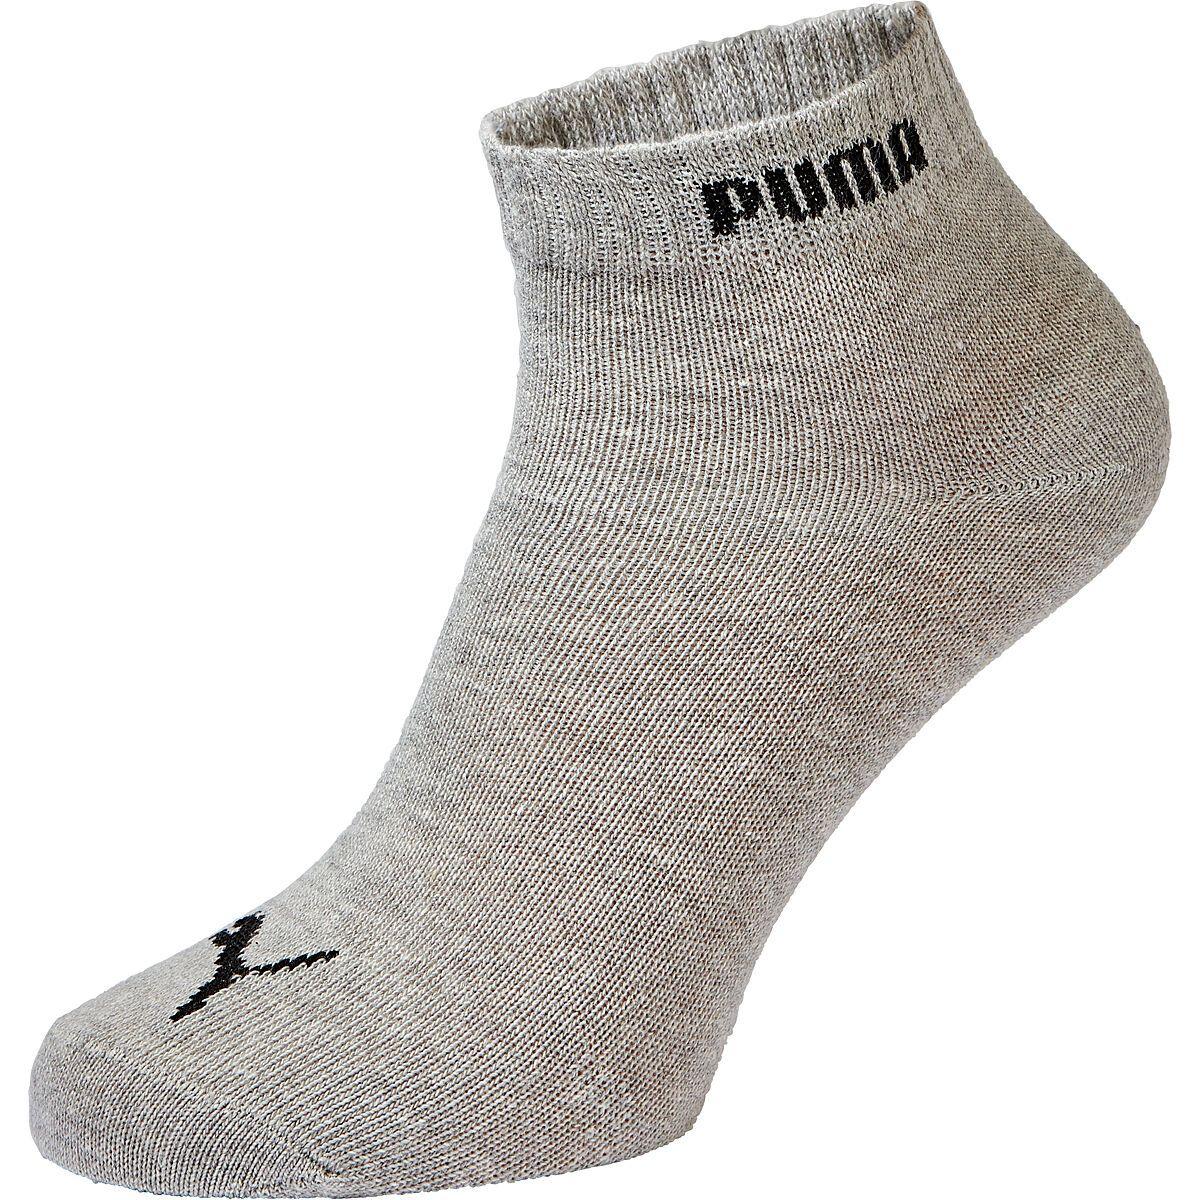 [Galeria.de] 6er Puma Unisex Quarter Socken für 8,31€ bei Fillialabholung